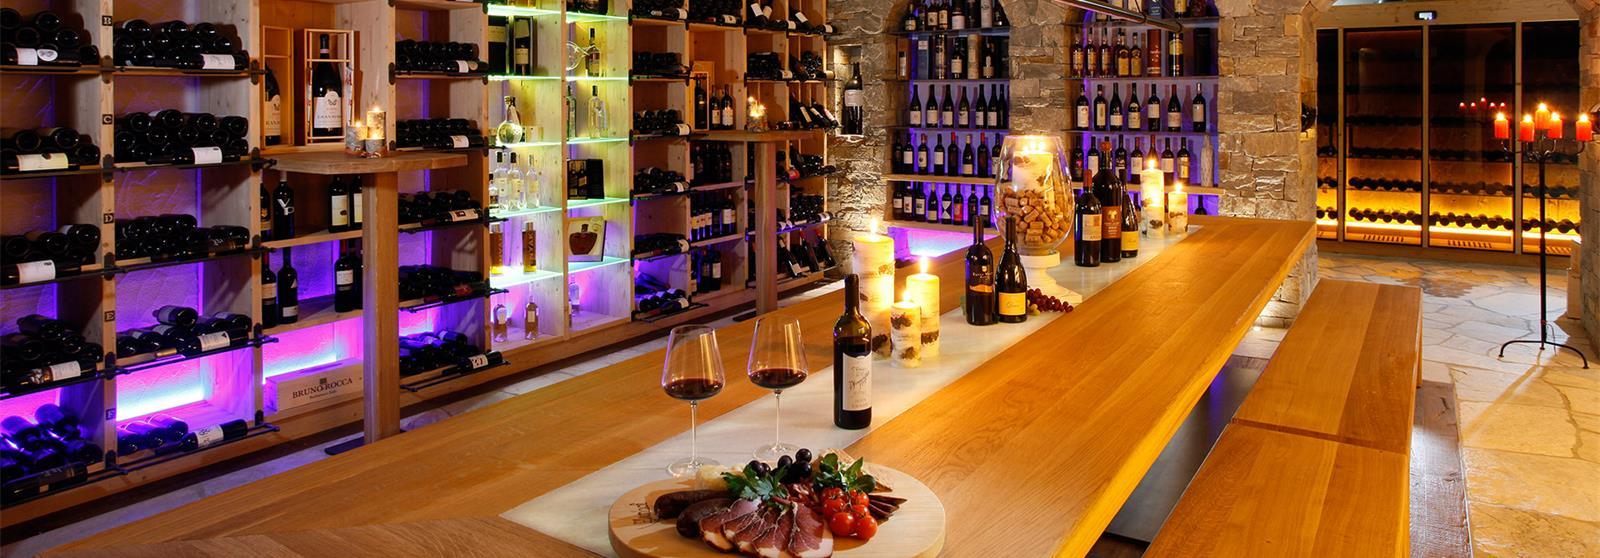 Wine Cellar Experience Plunhof Hotel